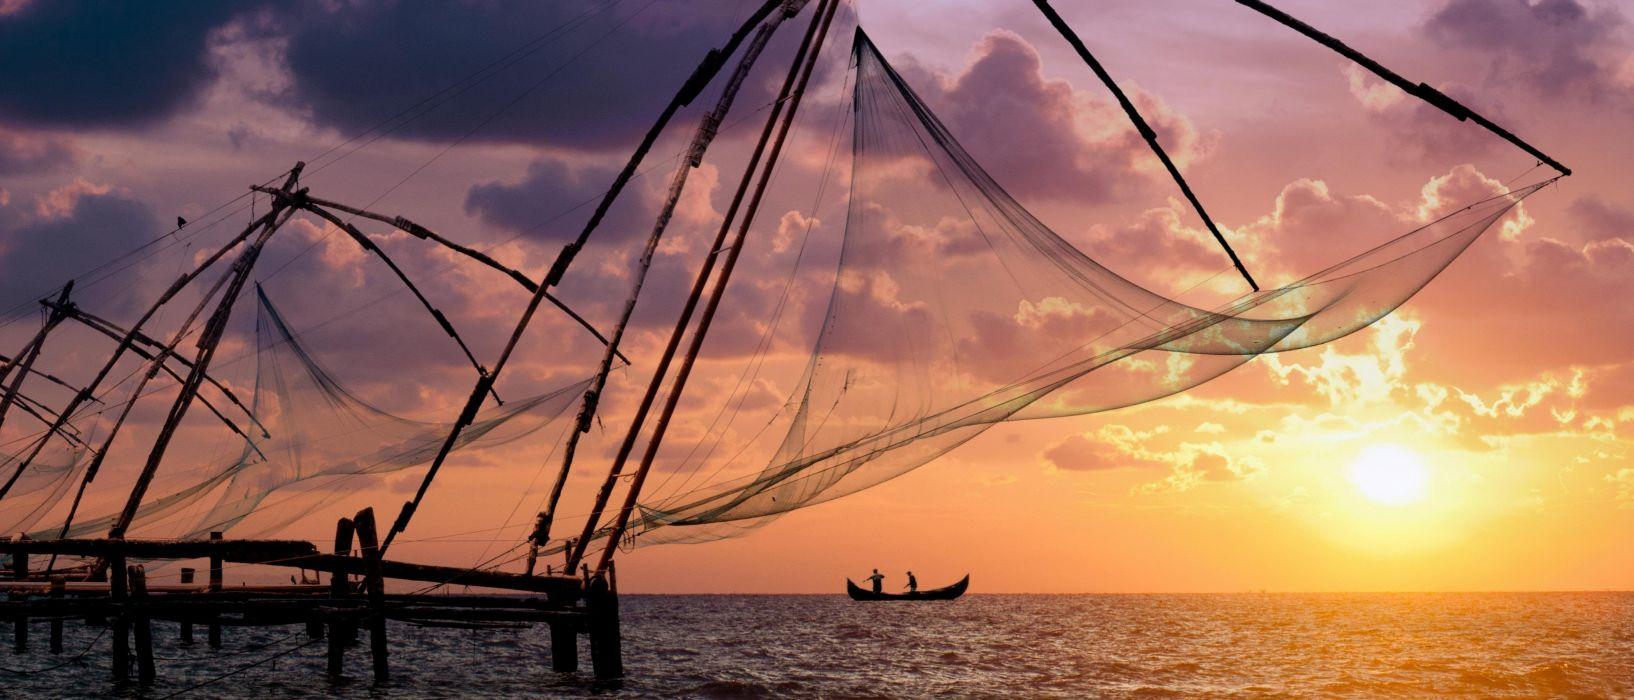 Kochi Kerala Blues Back Water Lagoons Sunset Beach Ship Channels Chinese Nets Skyscraper water city (1) wallpaper